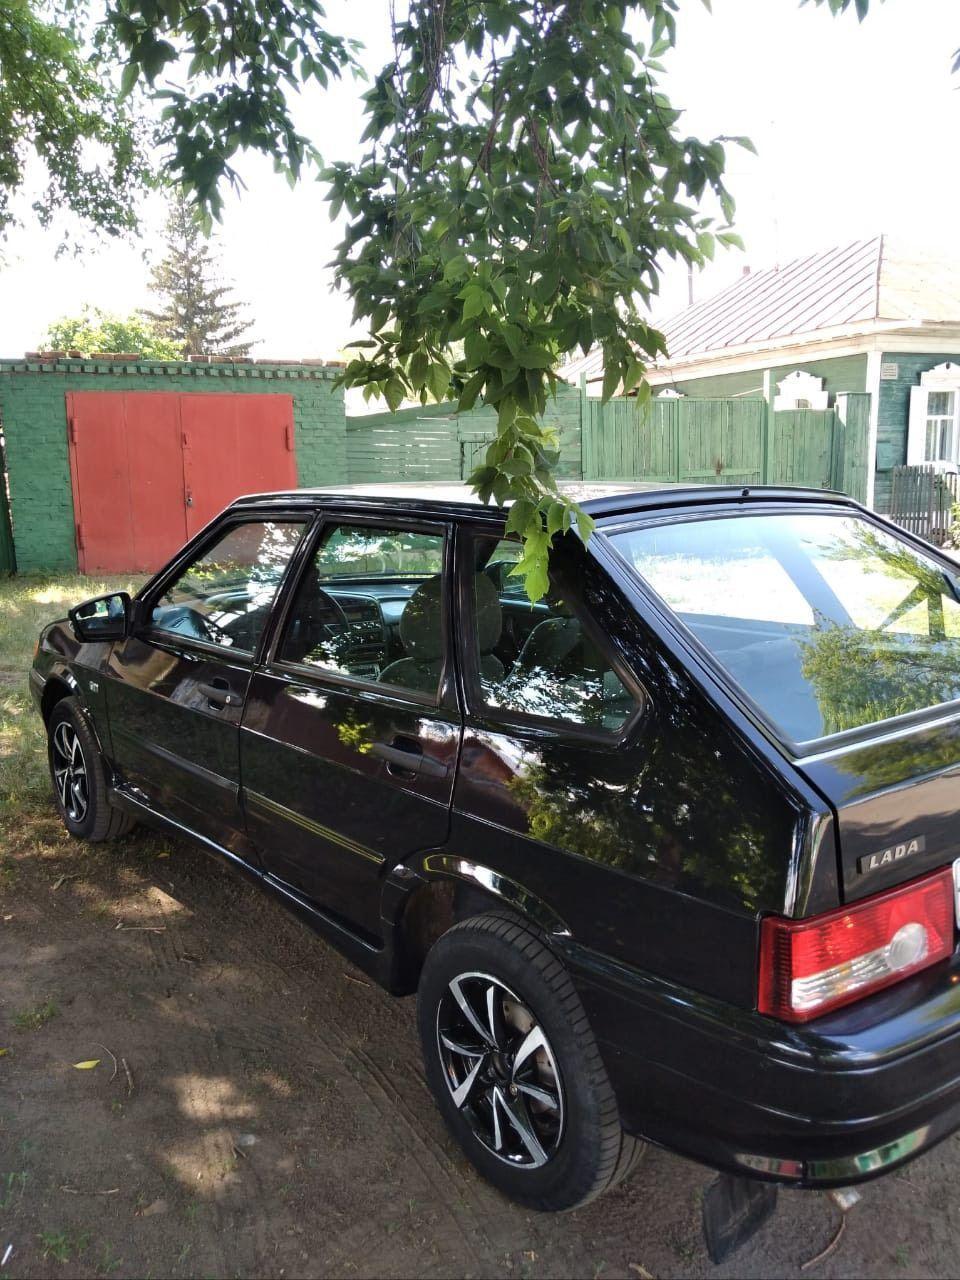 аренда авто в омске без водителя на месяц